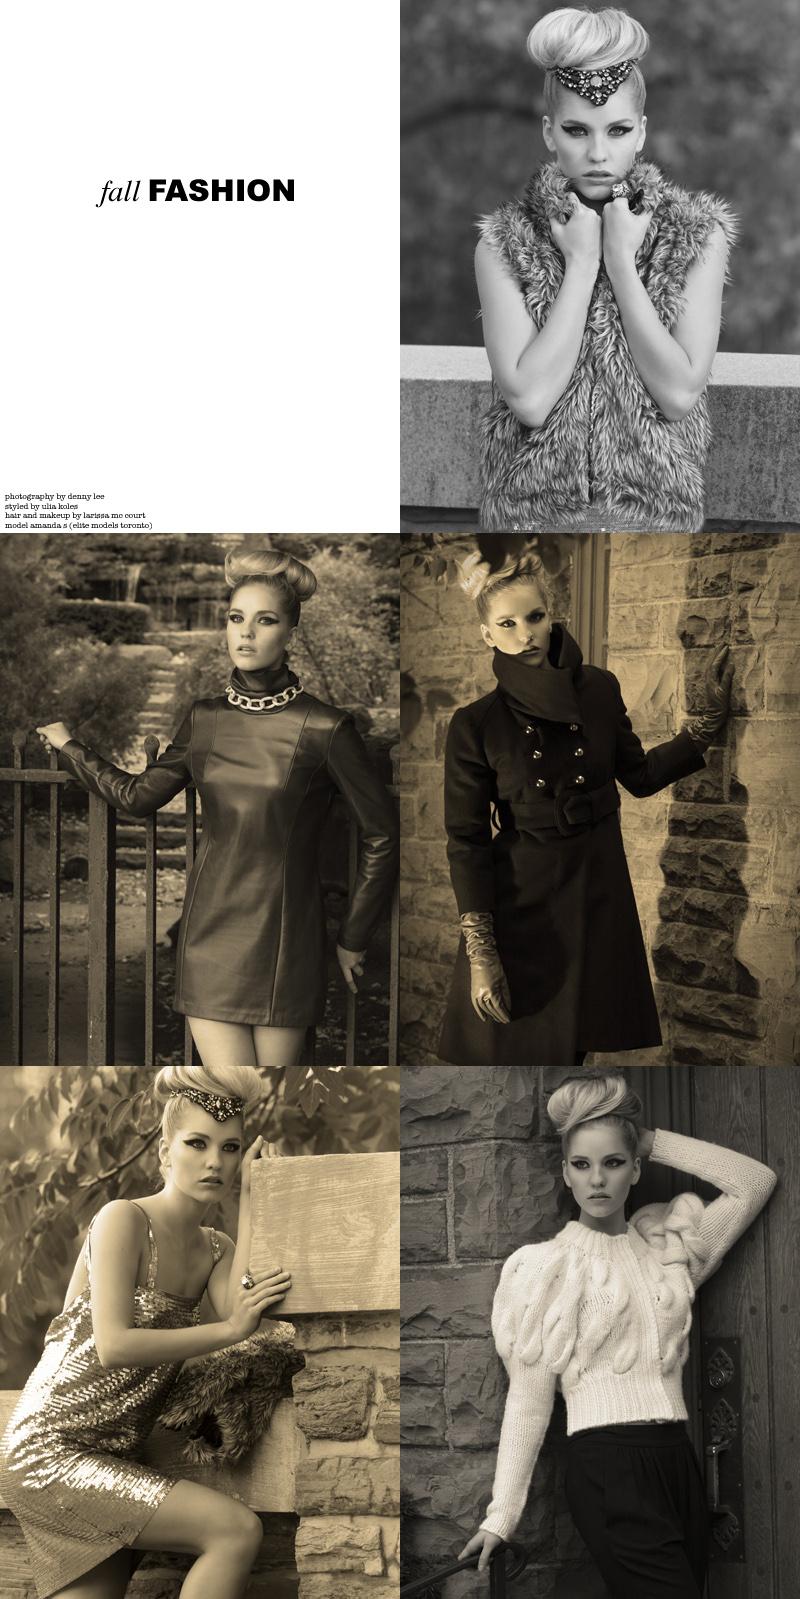 Dec 11, 2009 dennyleephotography.com Amanda S (Elite Models Toronto)